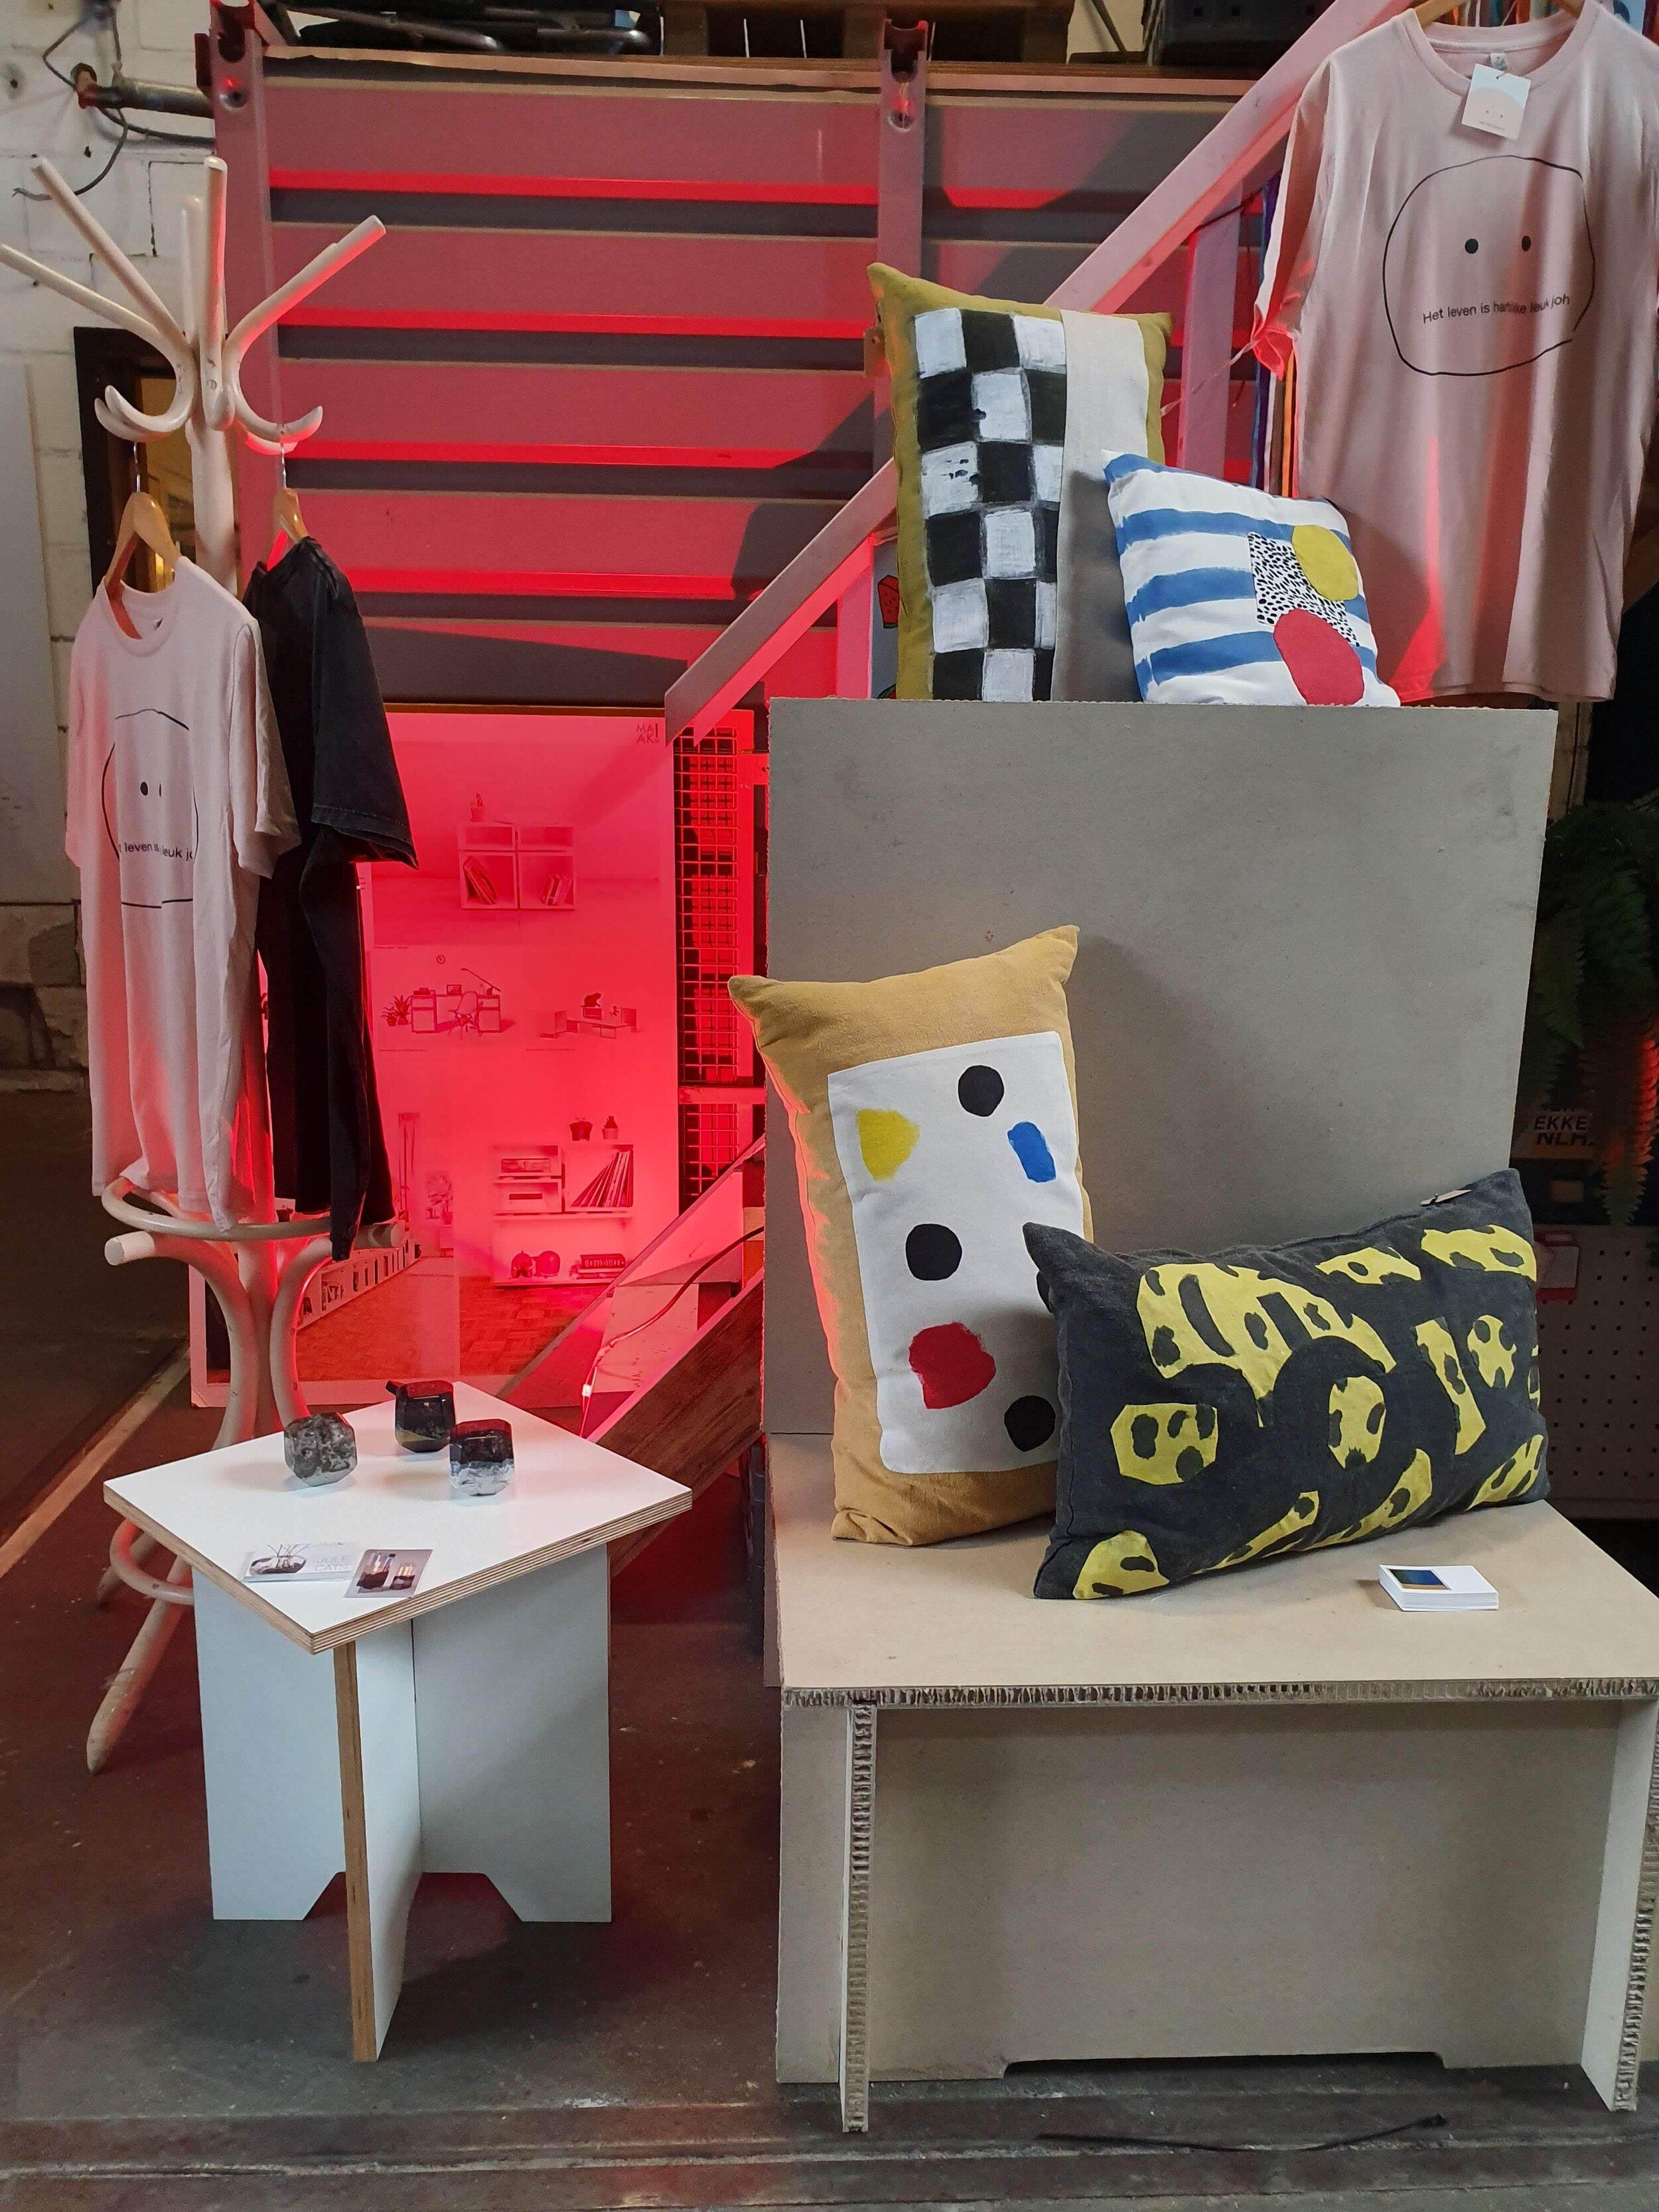 Werk van Vicky Pylorides (kussens) , Jule Cats (Paperweights), Studio Davero (meubels) en Malou Cohen (tshirts)